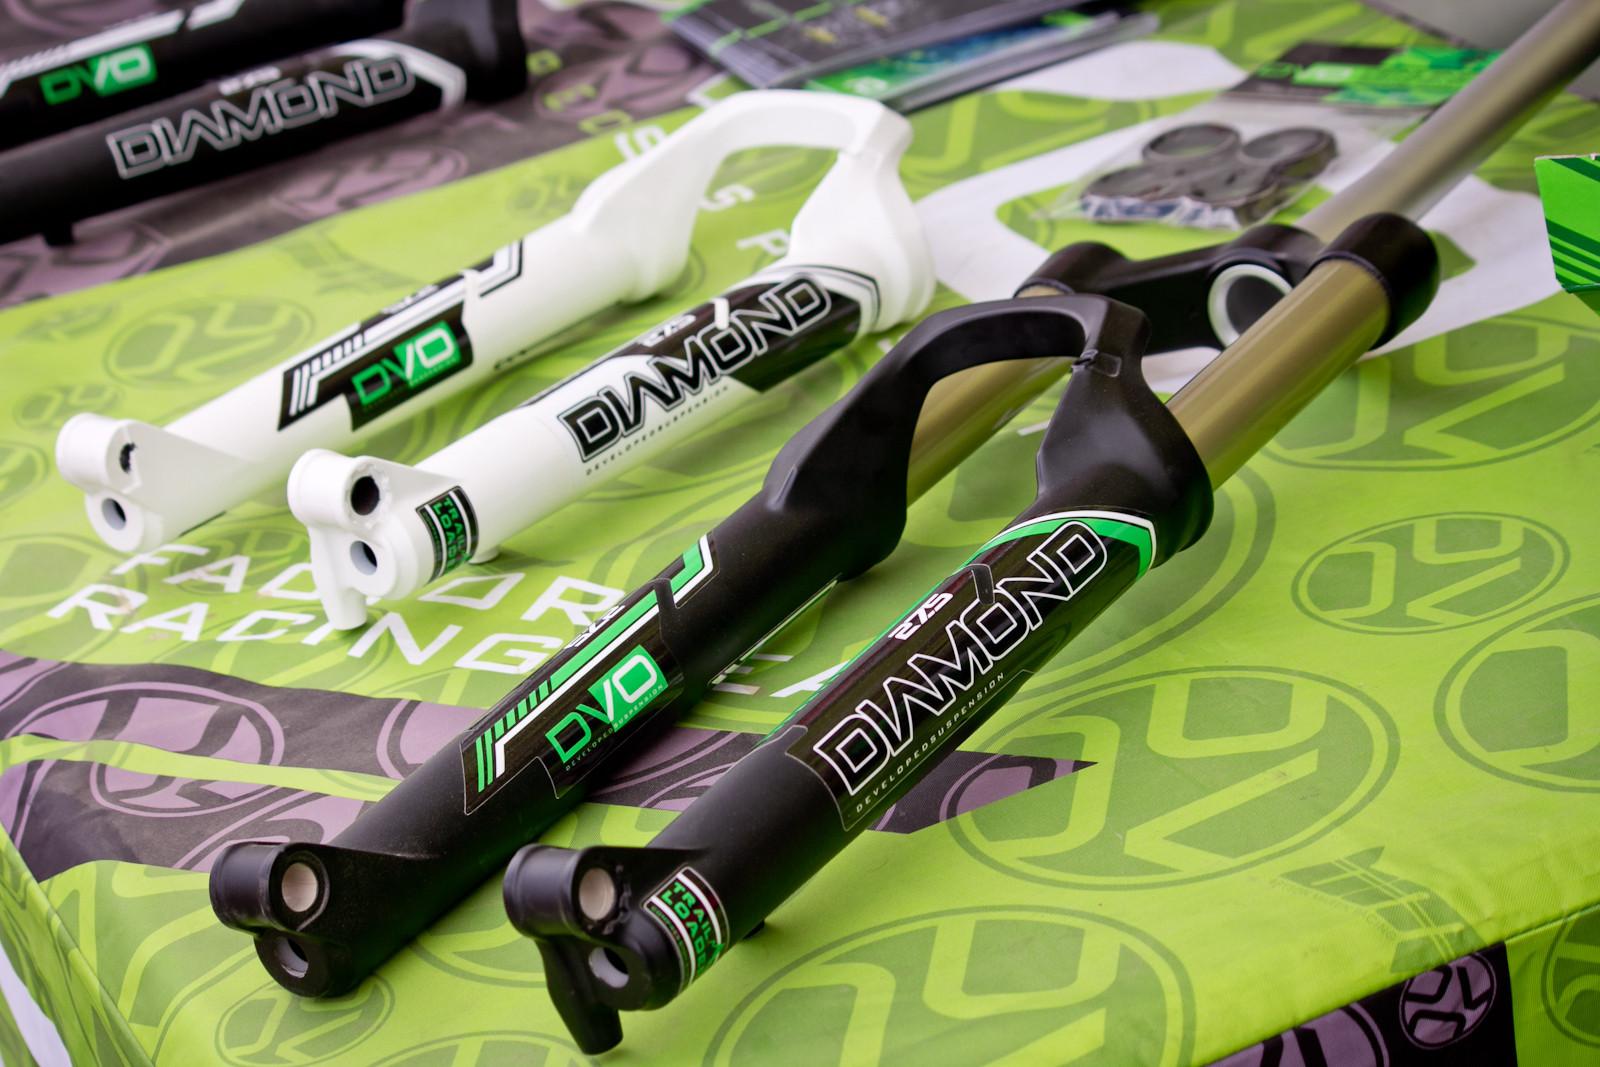 Prototype DVO Diamond Enduro Fork - Sea Otter Classic - 2014 Sea Otter Classic Pit Bits - 3rd Edition - Mountain Biking Pictures - Vital MTB